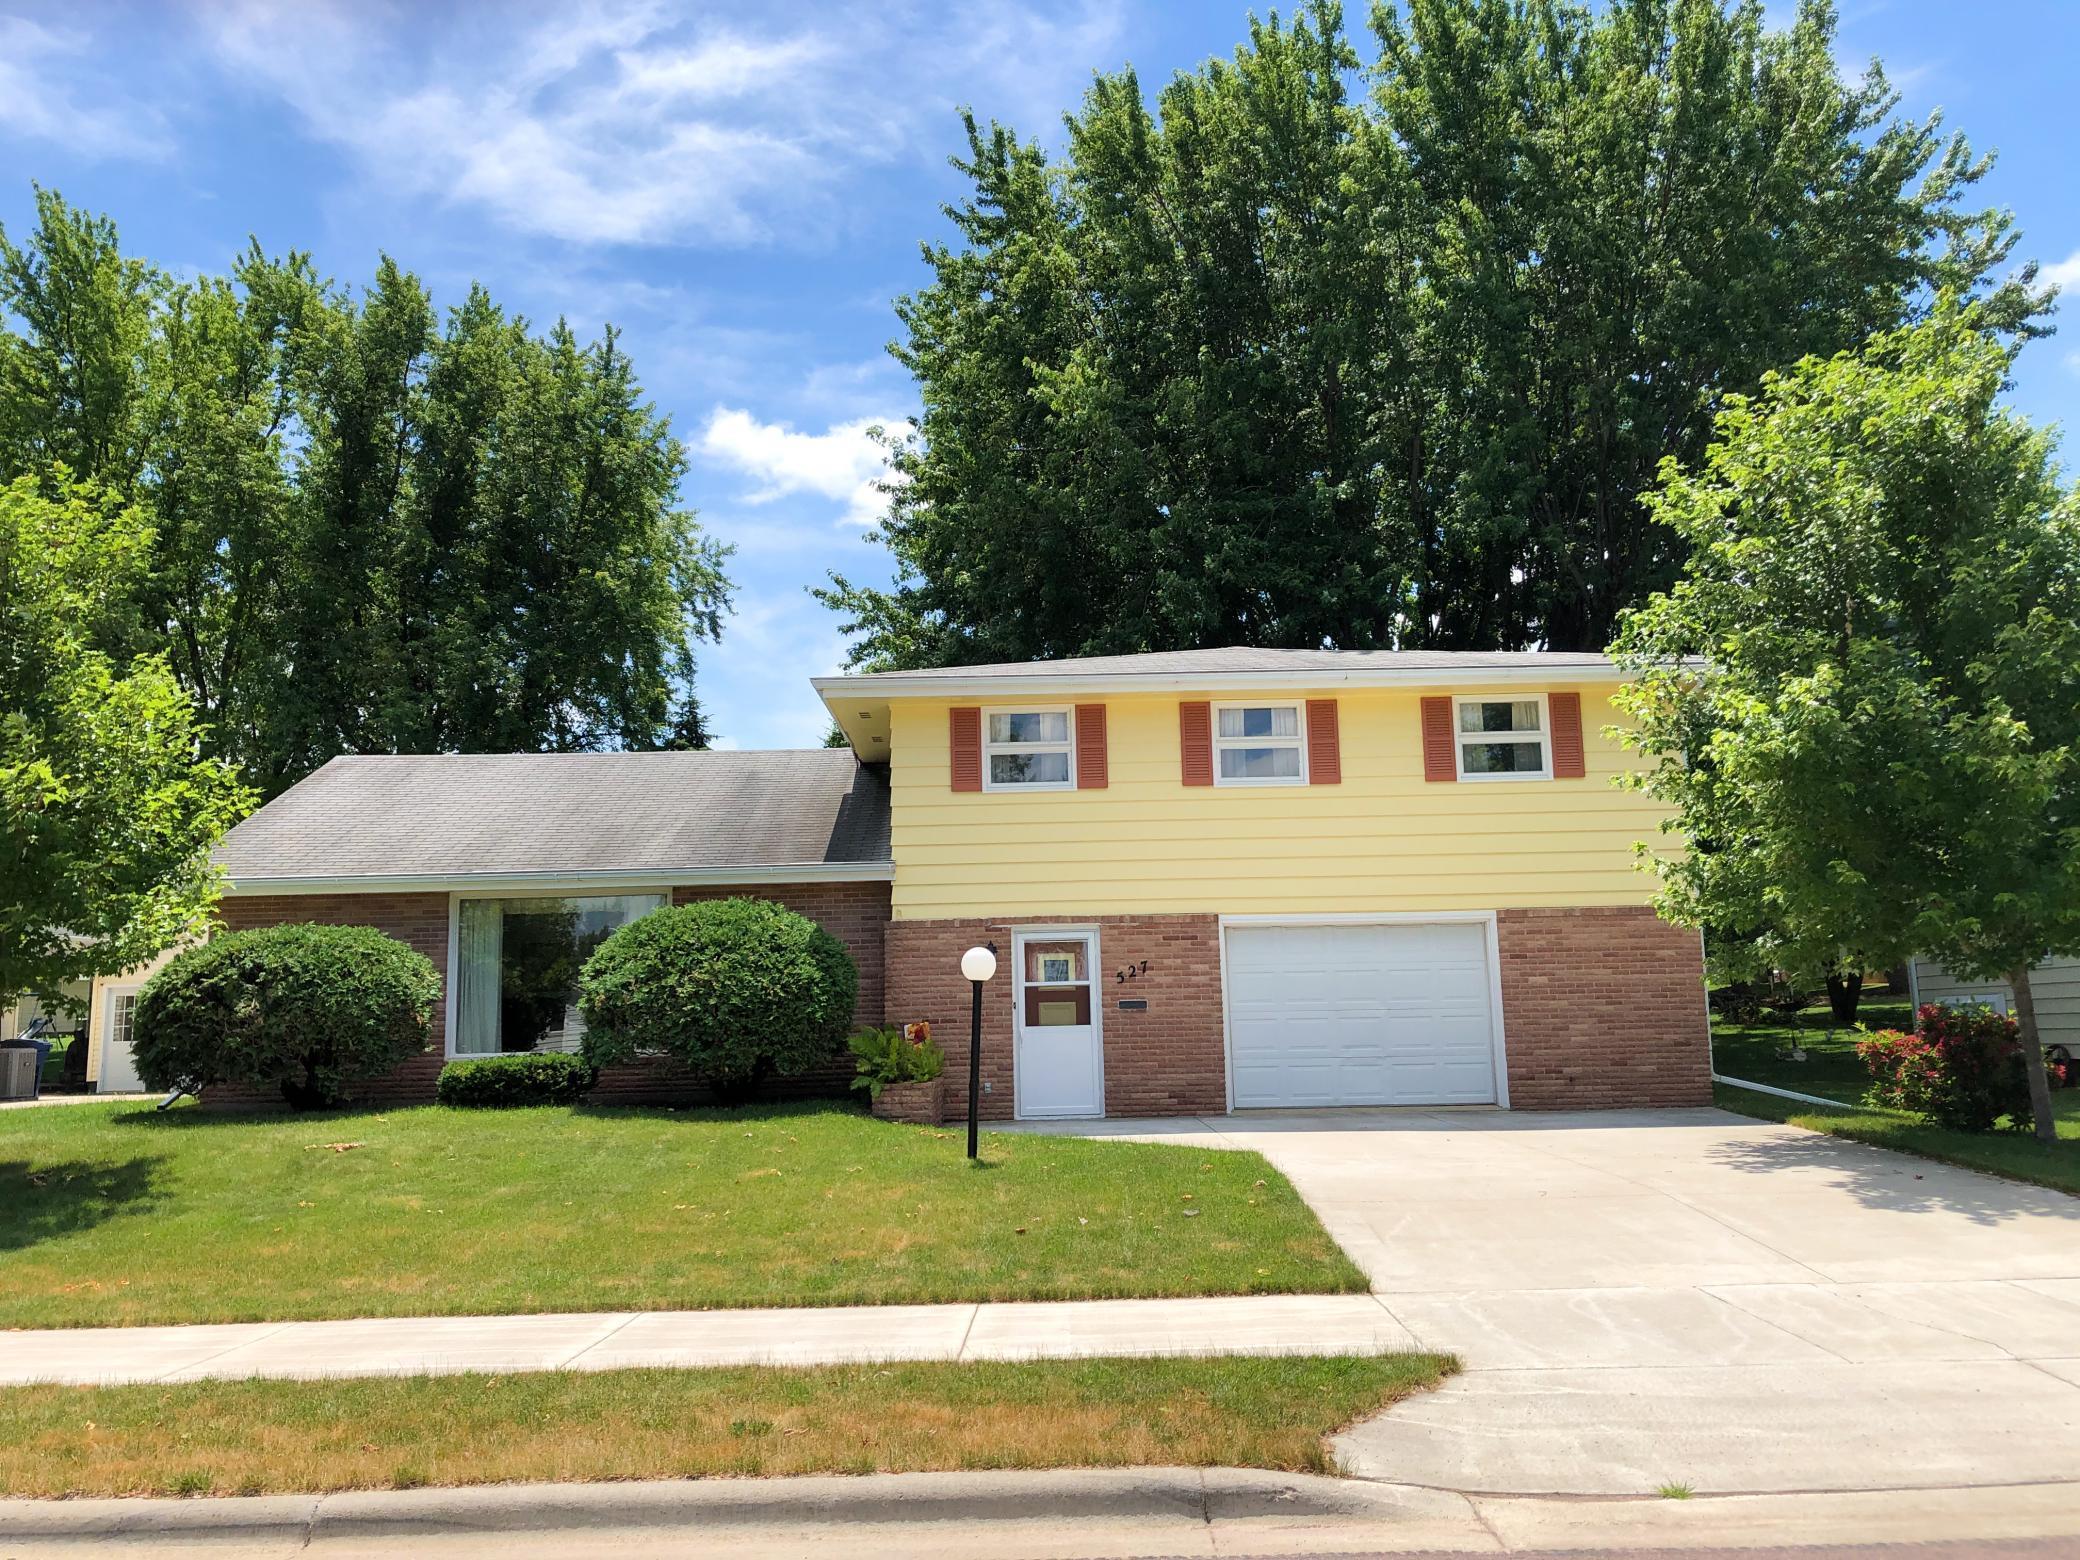 527 Van Dusen Property Photo - Springfield, MN real estate listing